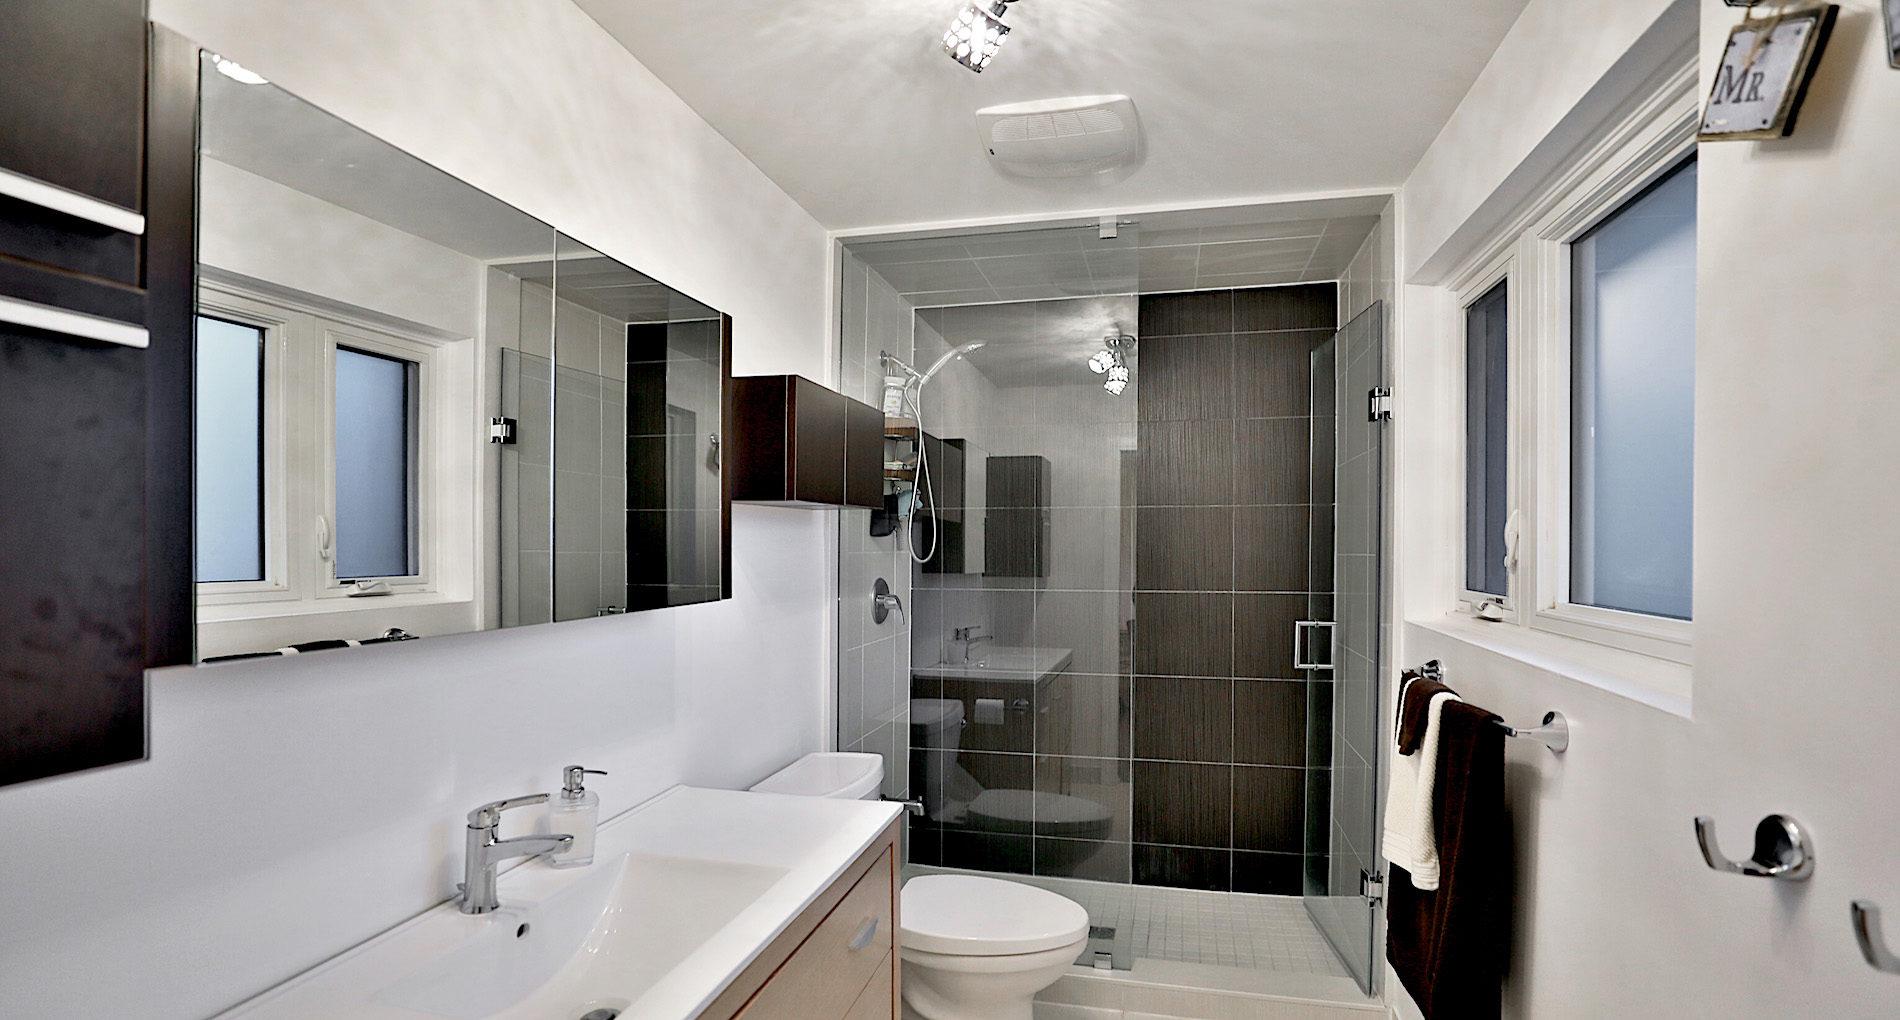 Bathroom Renovation Westtoronto Threadneedleaddition Slider1